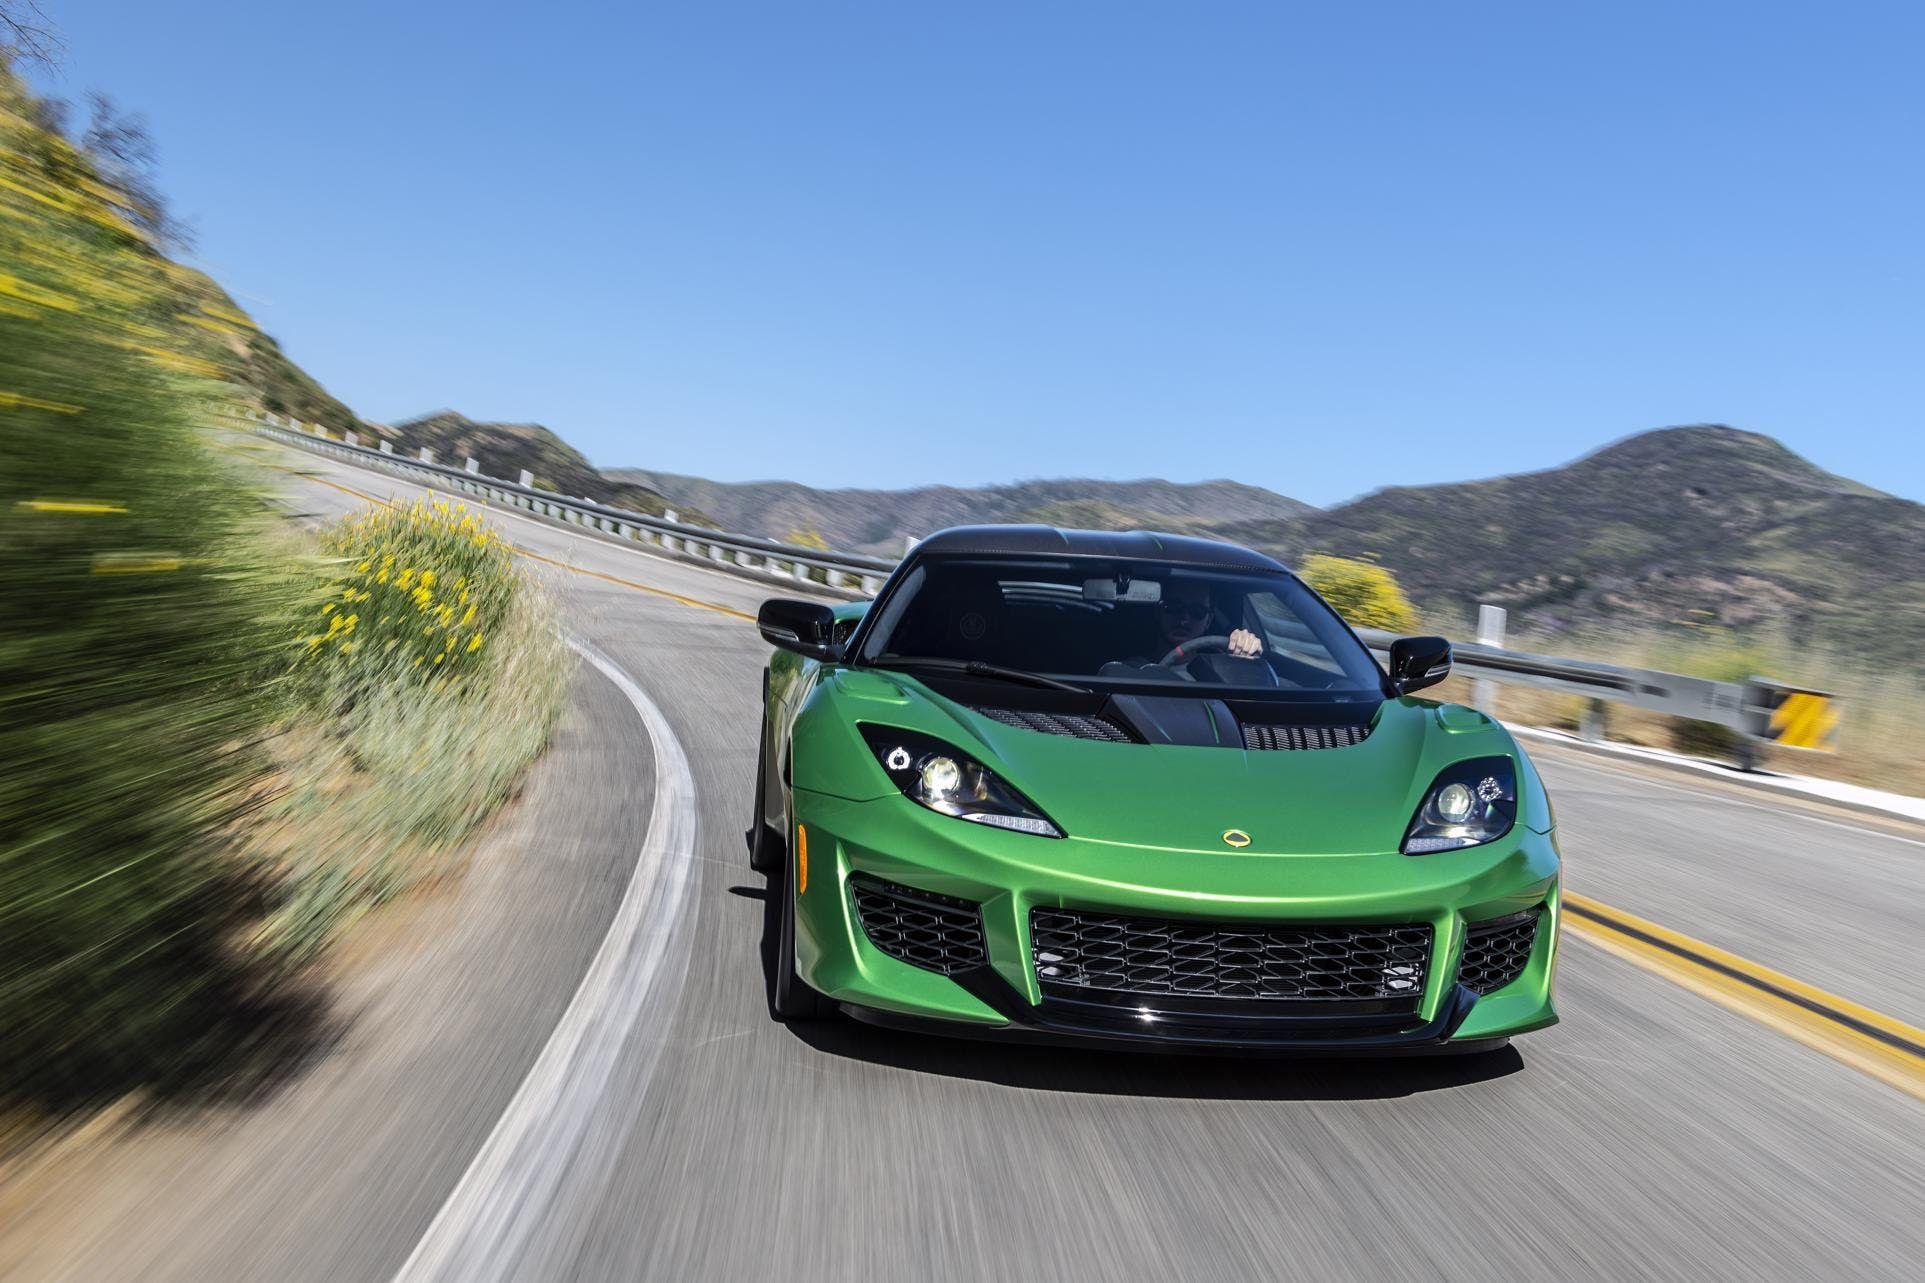 2020 Lotus Evora Gt Review The Anti Modern Sports Car In 2020 Sports Car Porsche